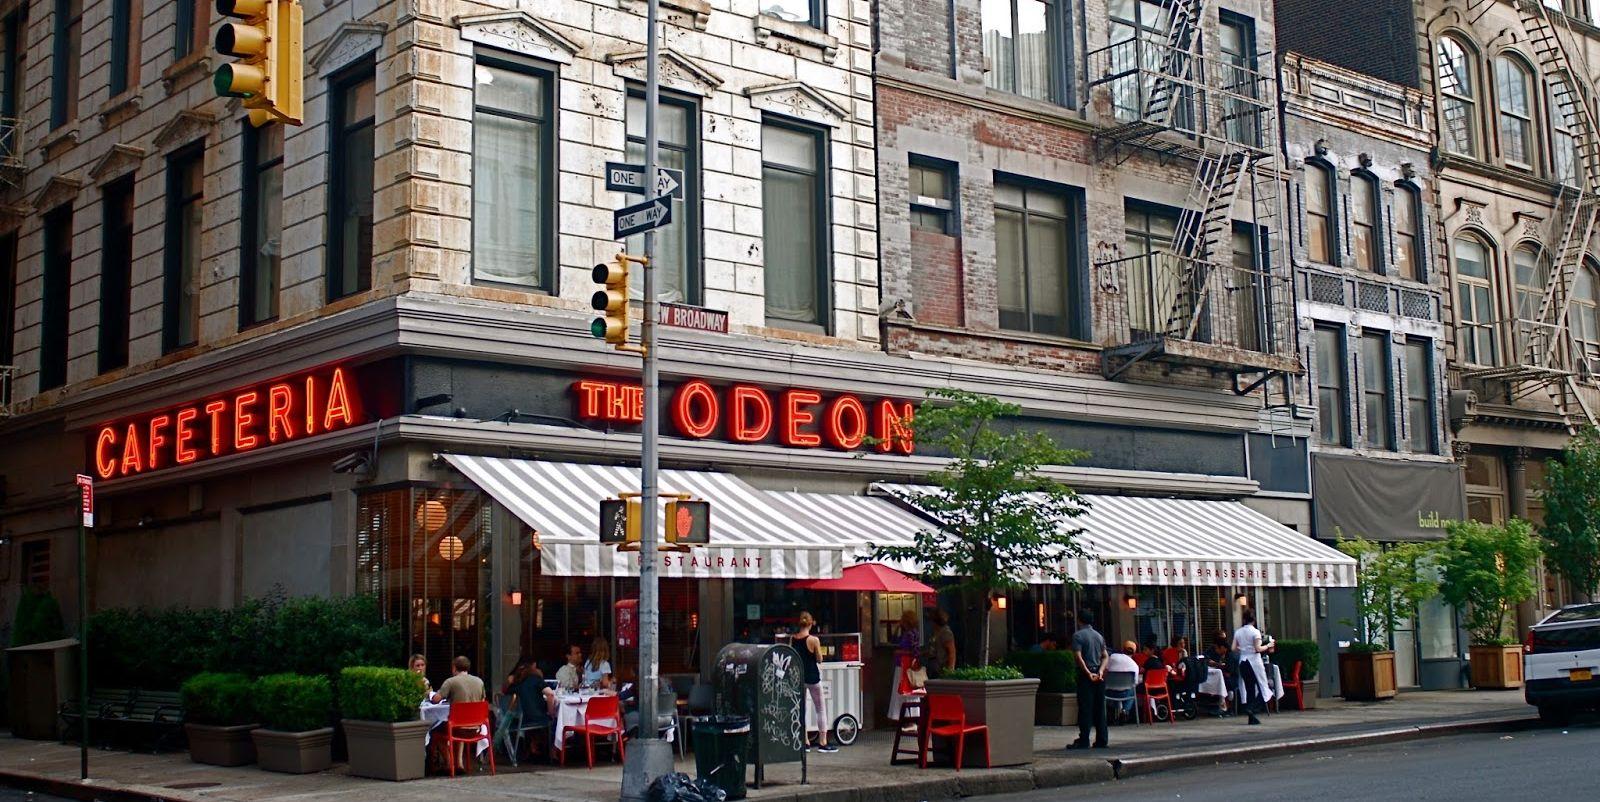 The Best Restaurants In New York City 10 Best Restaurants In New